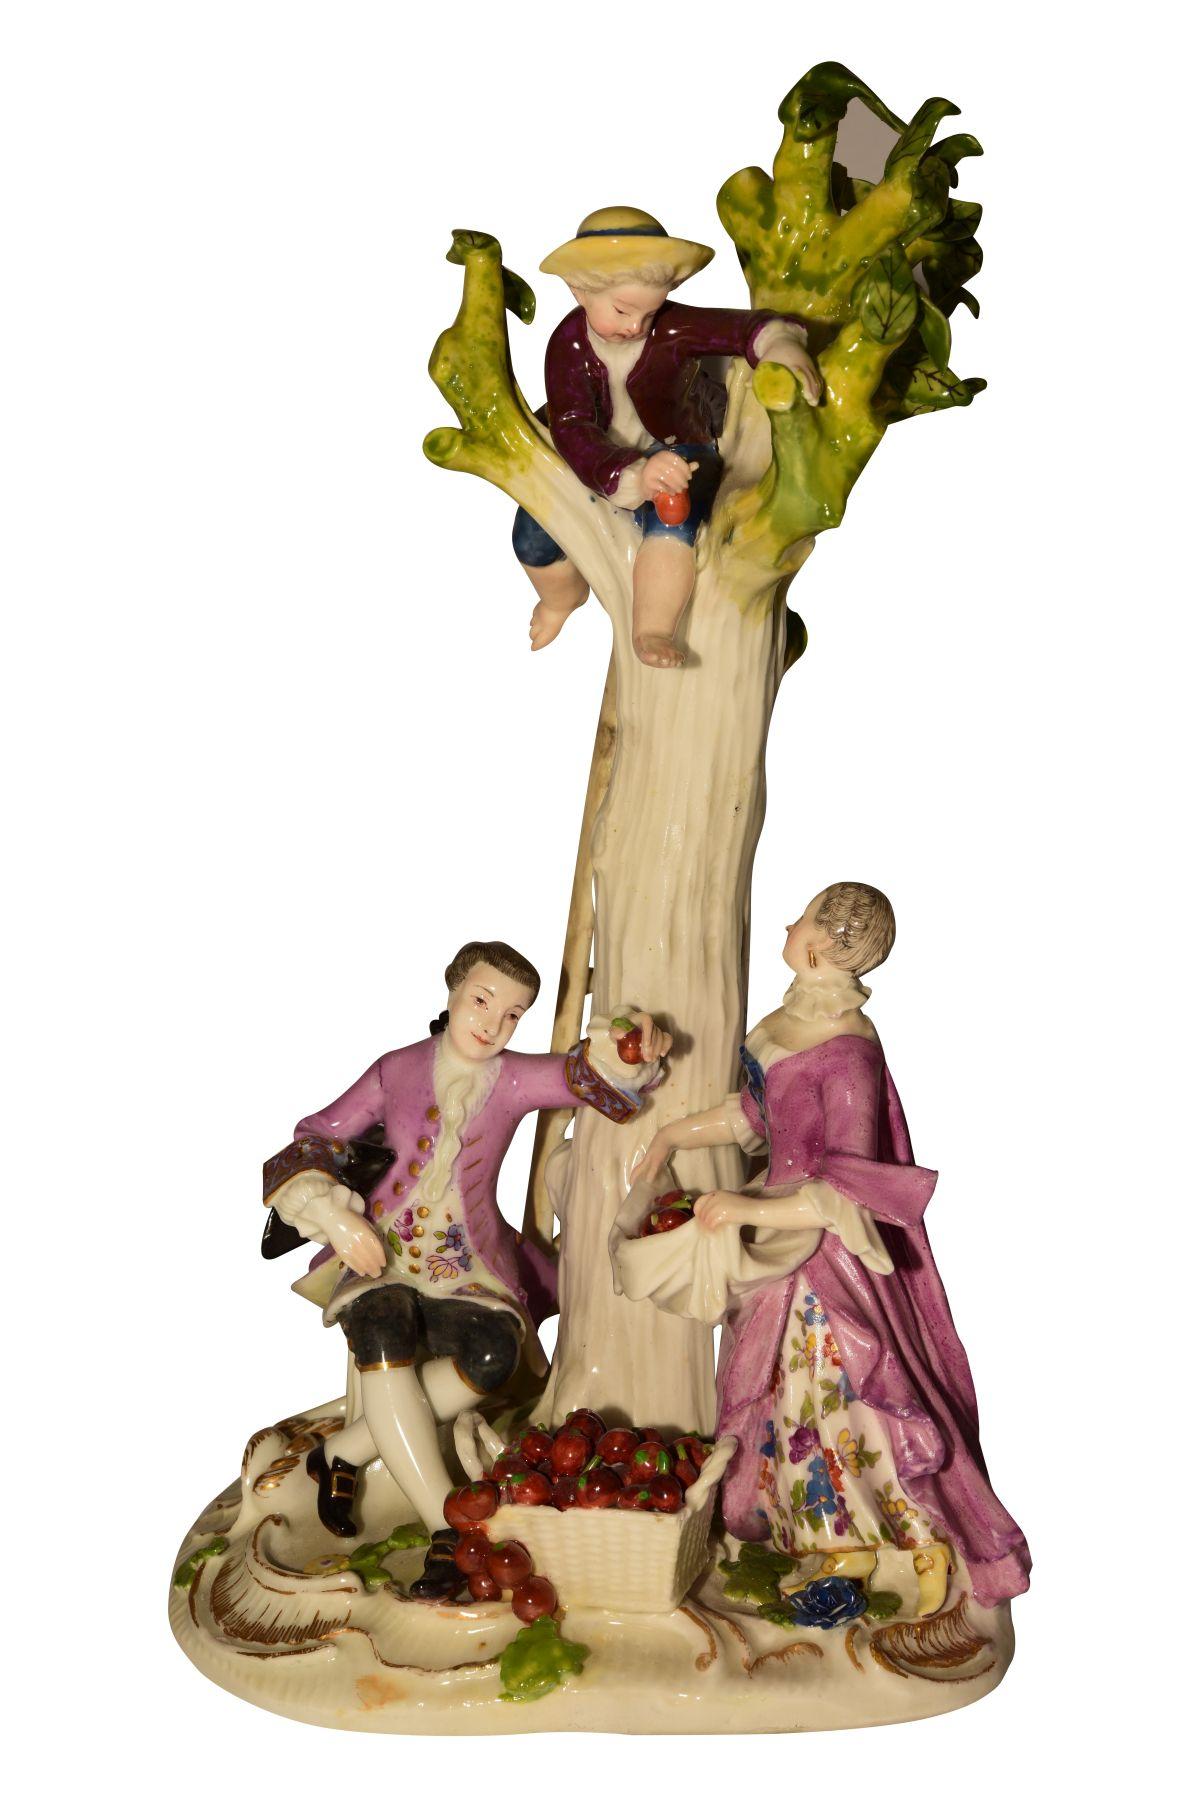 "#58 1 group of Meissen 1750 apple pickers   Figur ""Apfelpflücker"" Meissen 1750 Image"